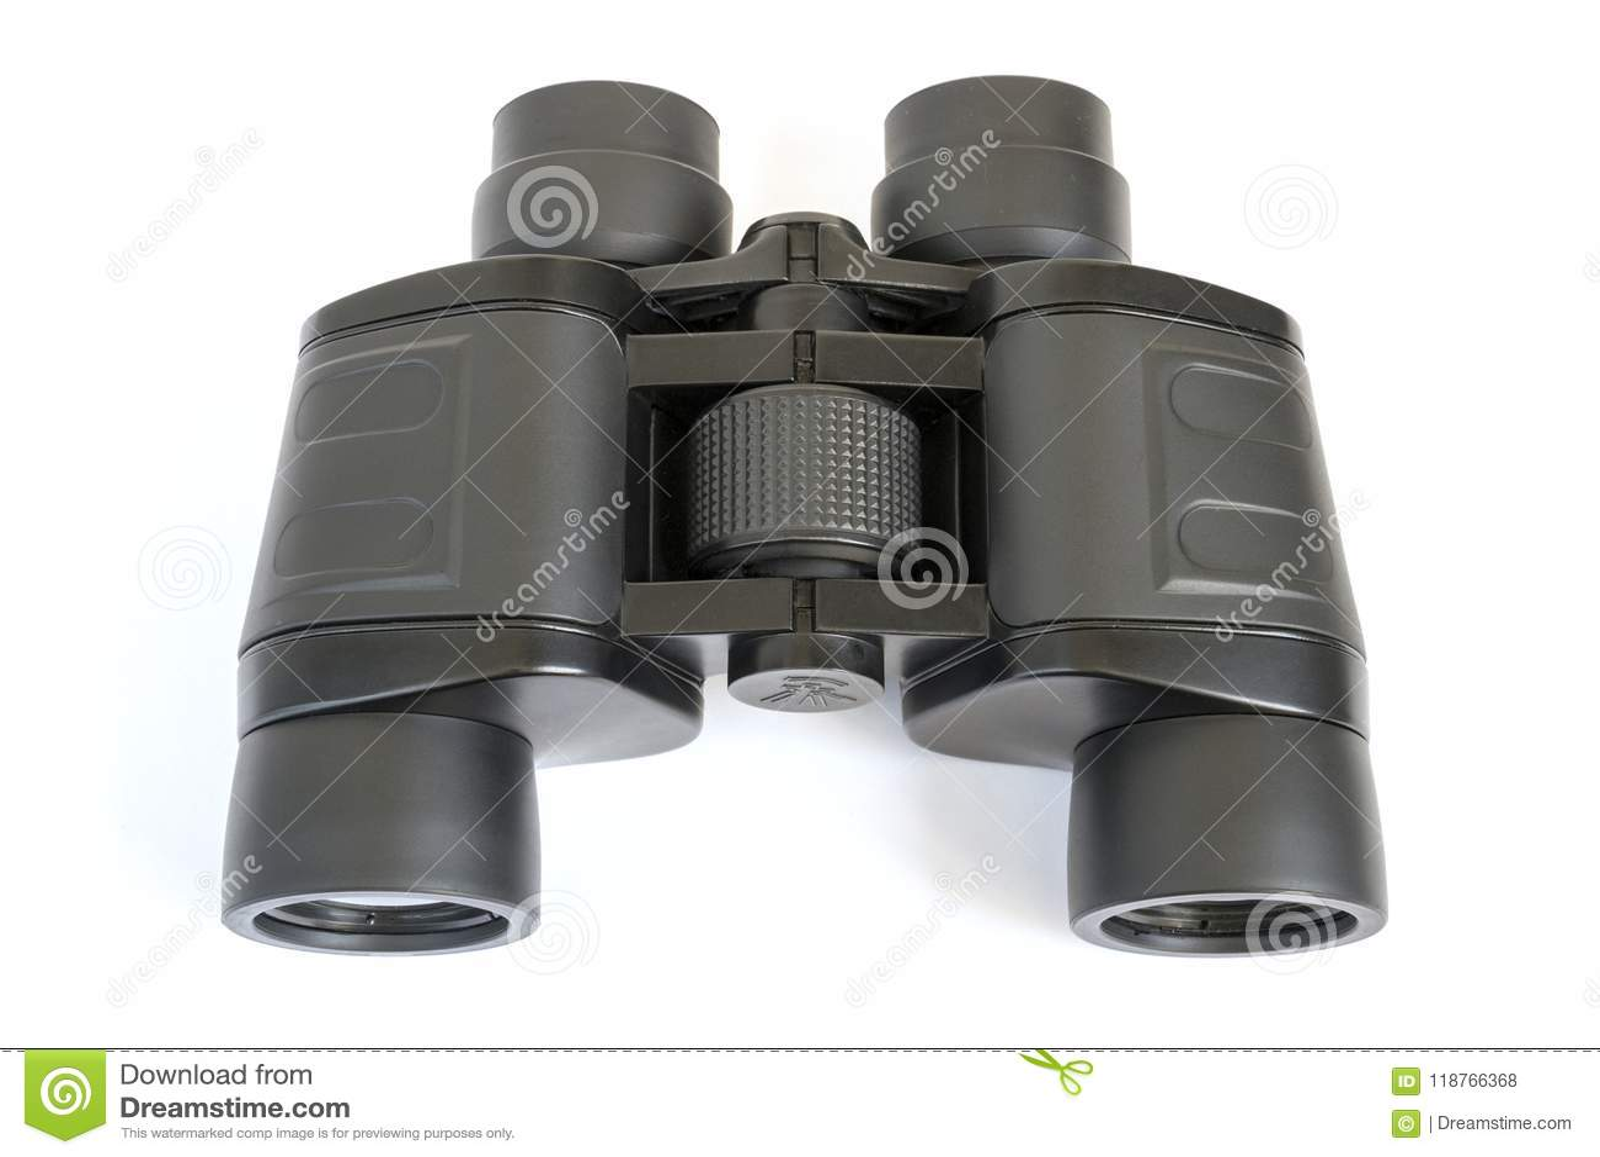 Black binoculars on a white background.